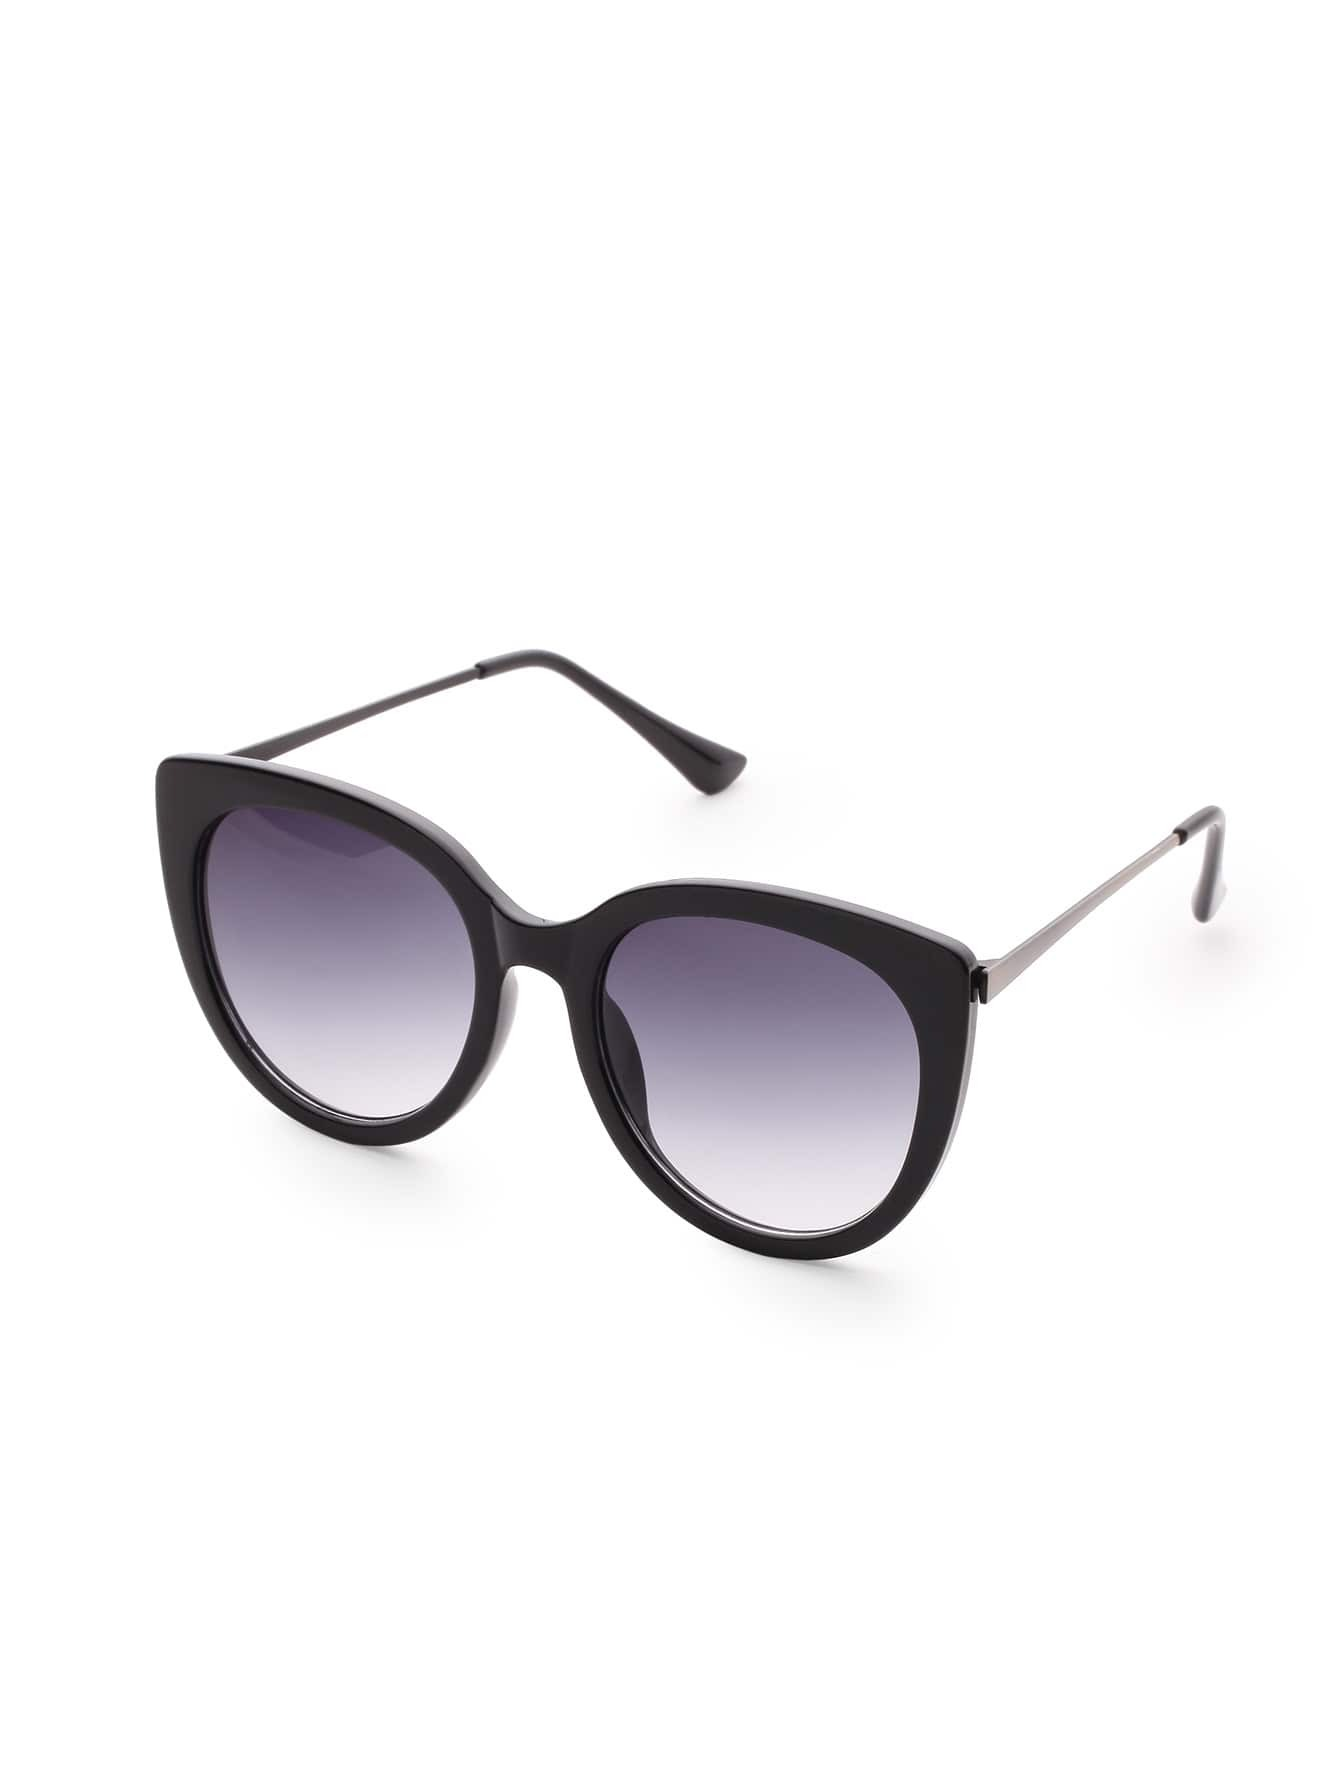 Black Frame Cat Eye Sunglasses sunglass170324302